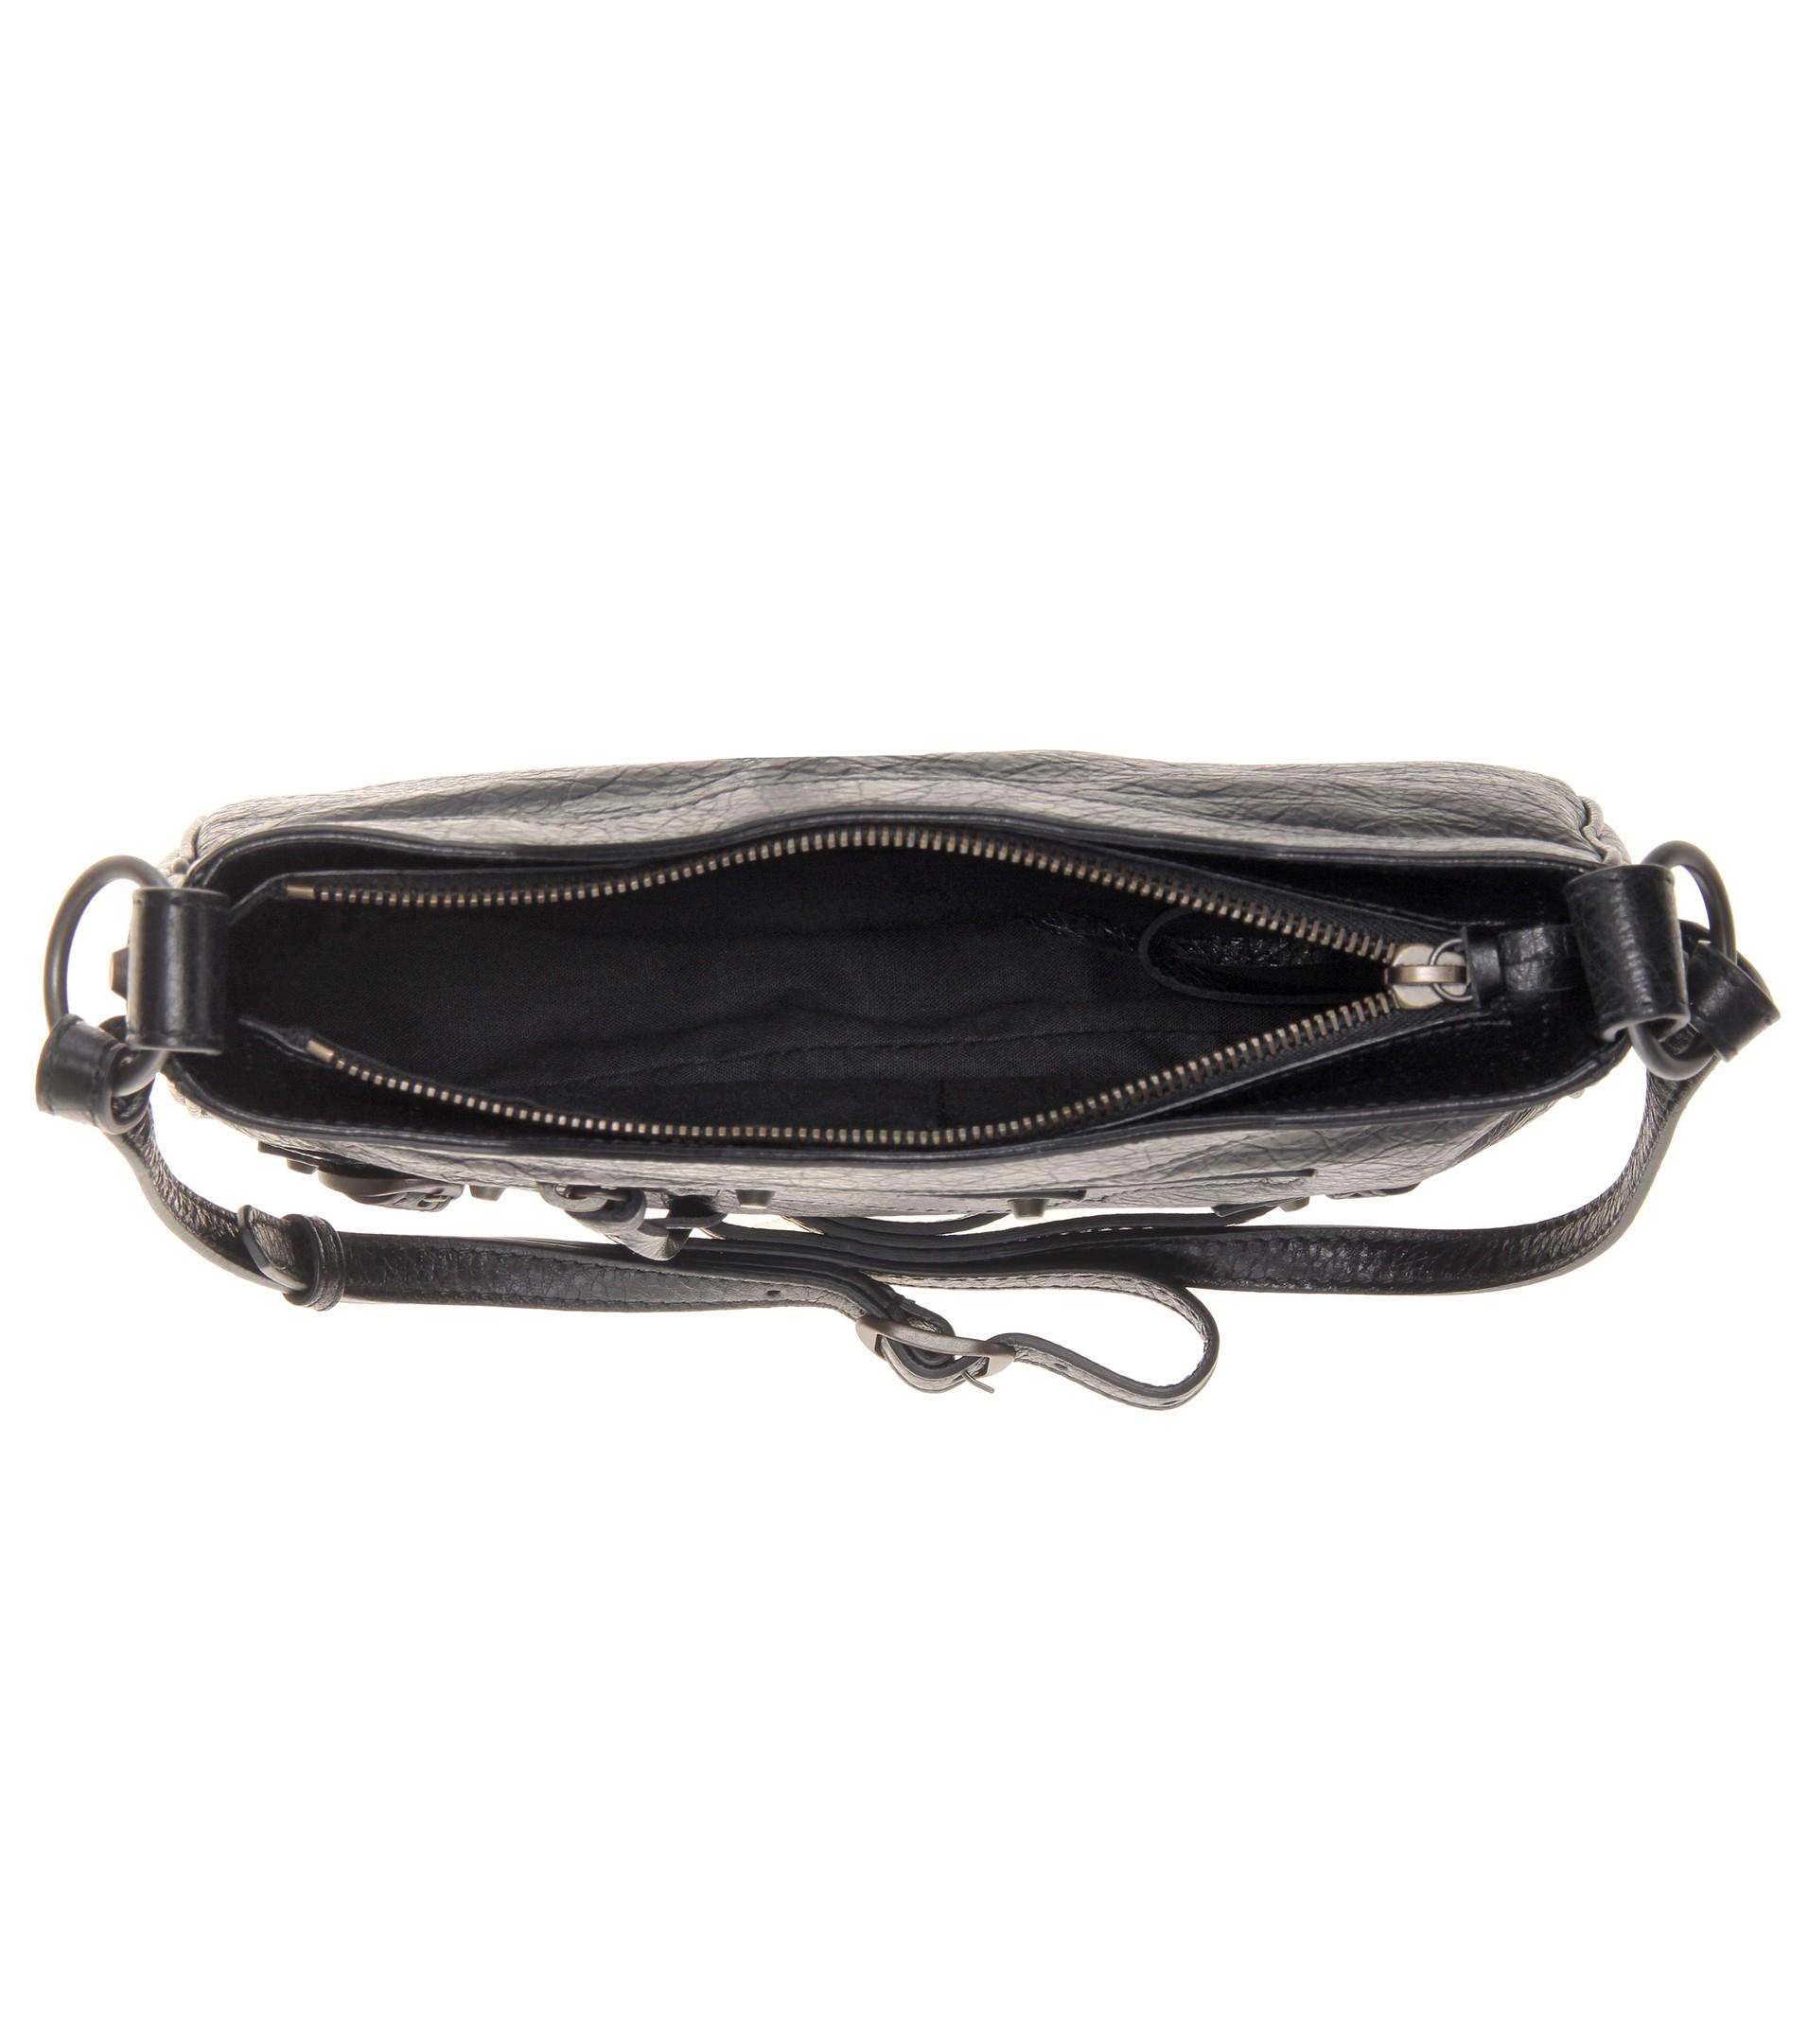 e41df8f79a Balenciaga Classic Hip Leather Shoulder Bag in Black - Lyst